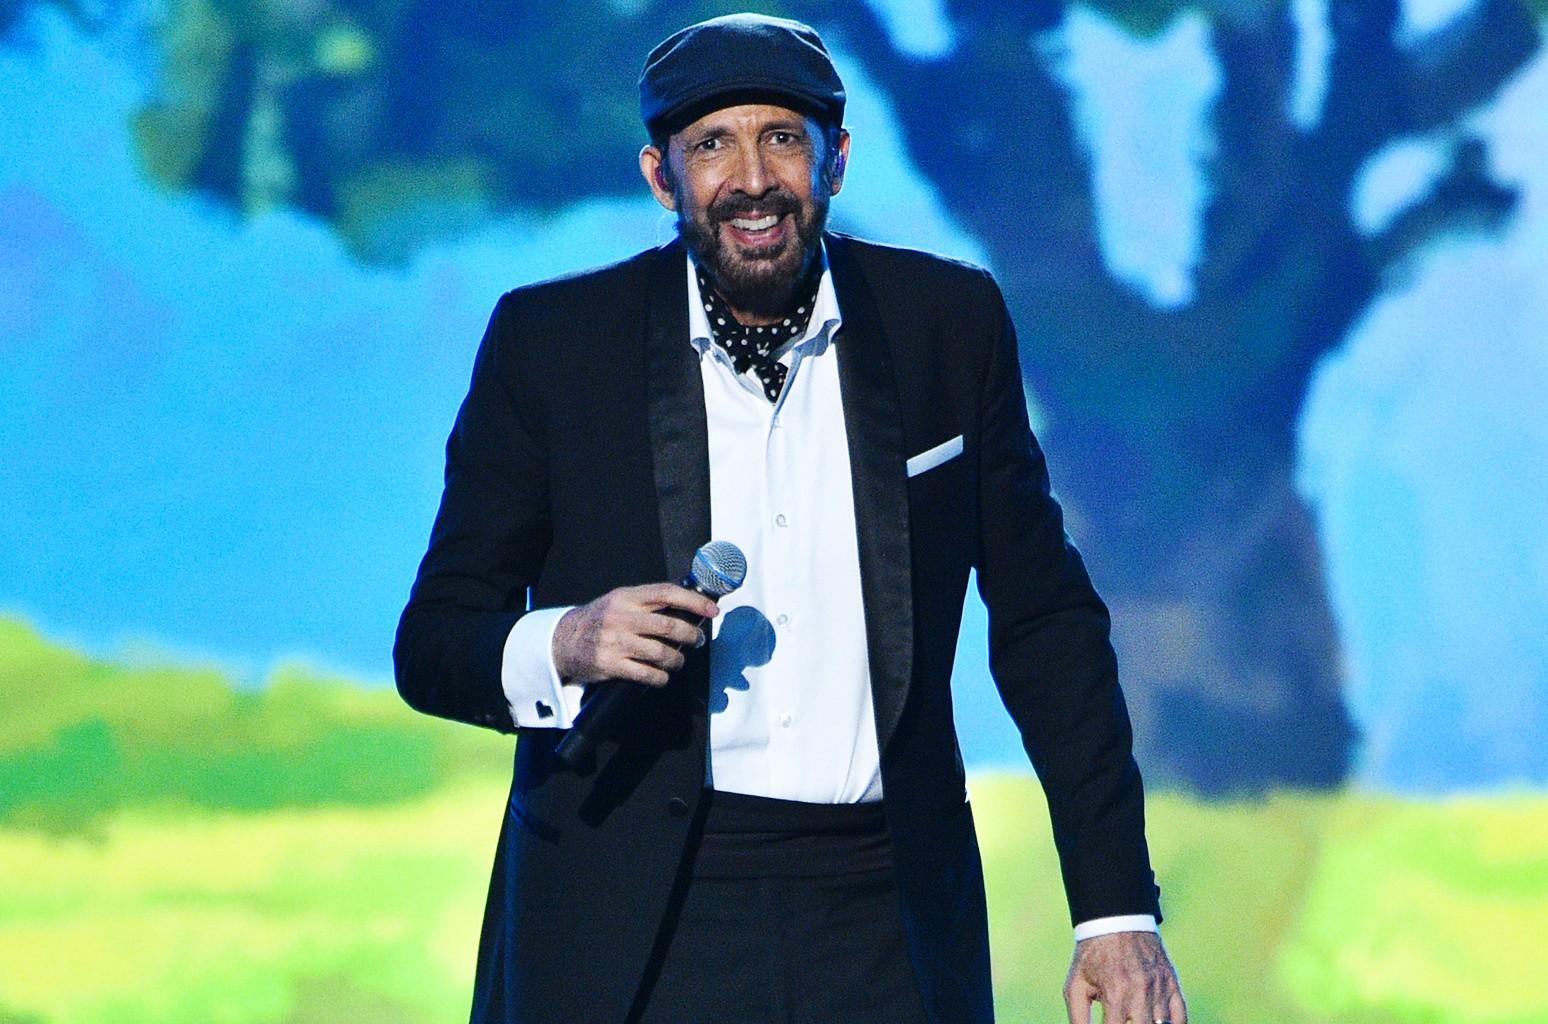 Juan Luis Guerra, Latin Recording Academy, Person of the Year gala